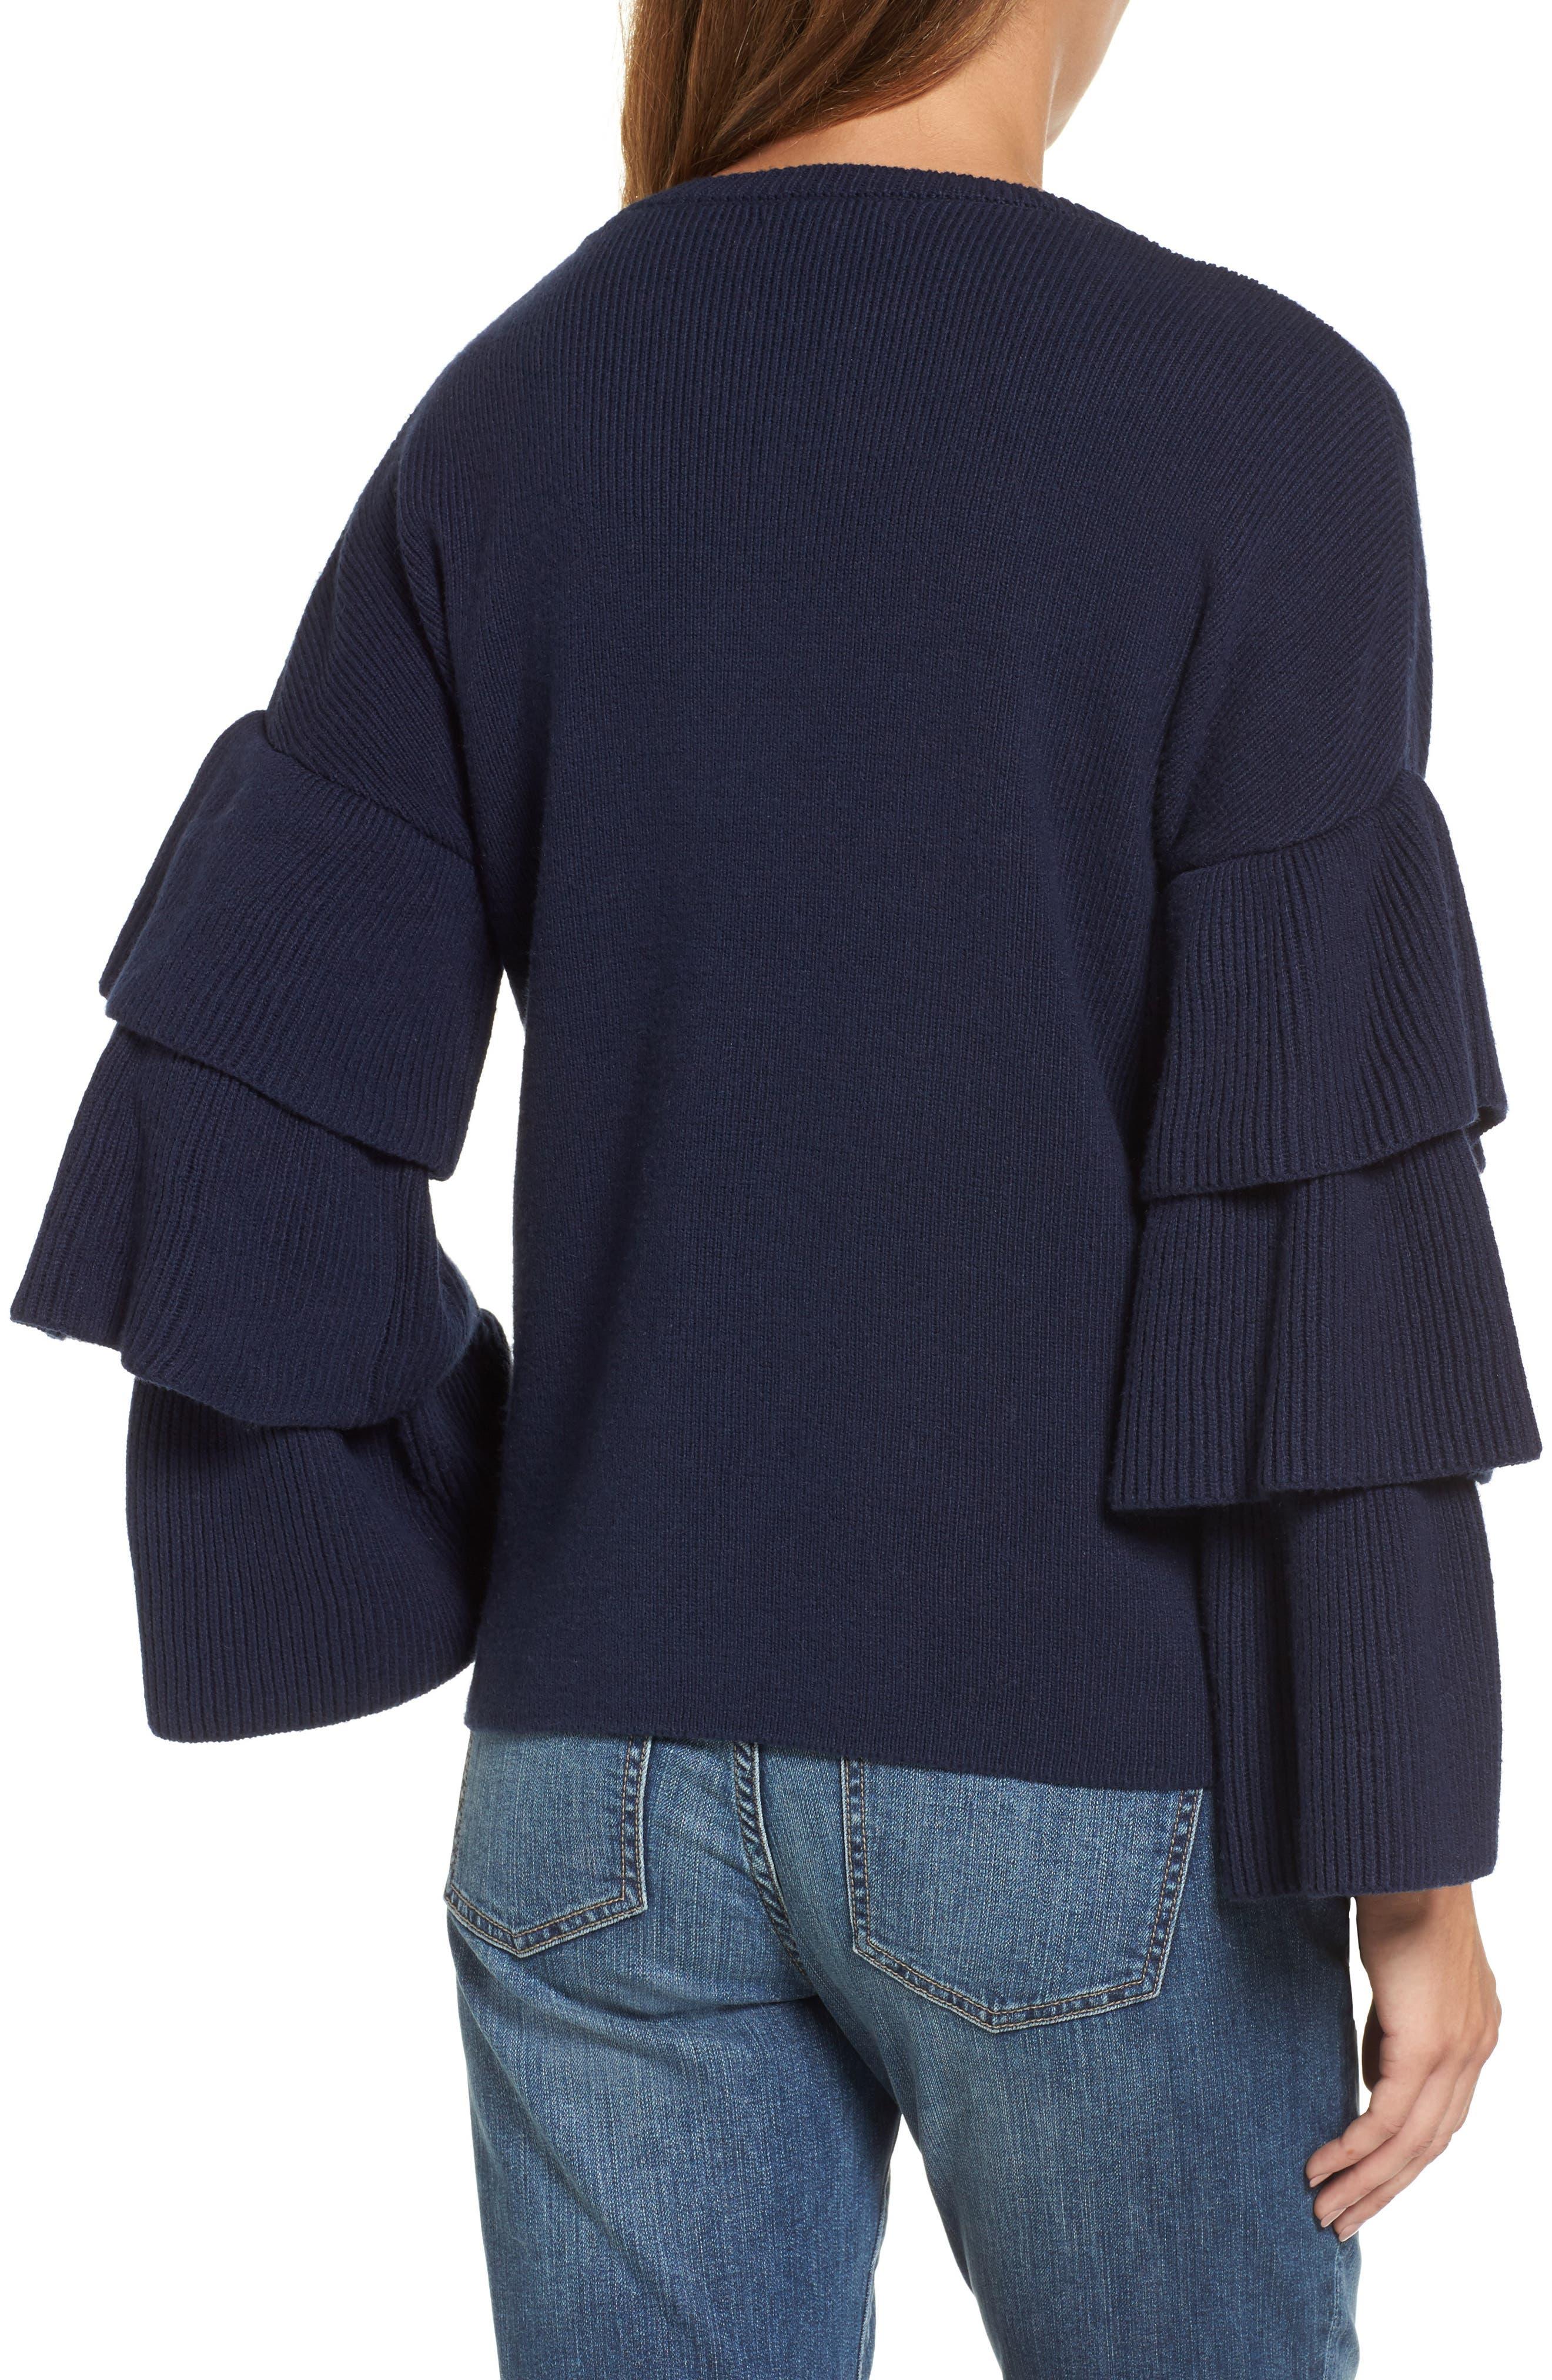 Ruffle Sleeve Sweater,                             Alternate thumbnail 7, color,